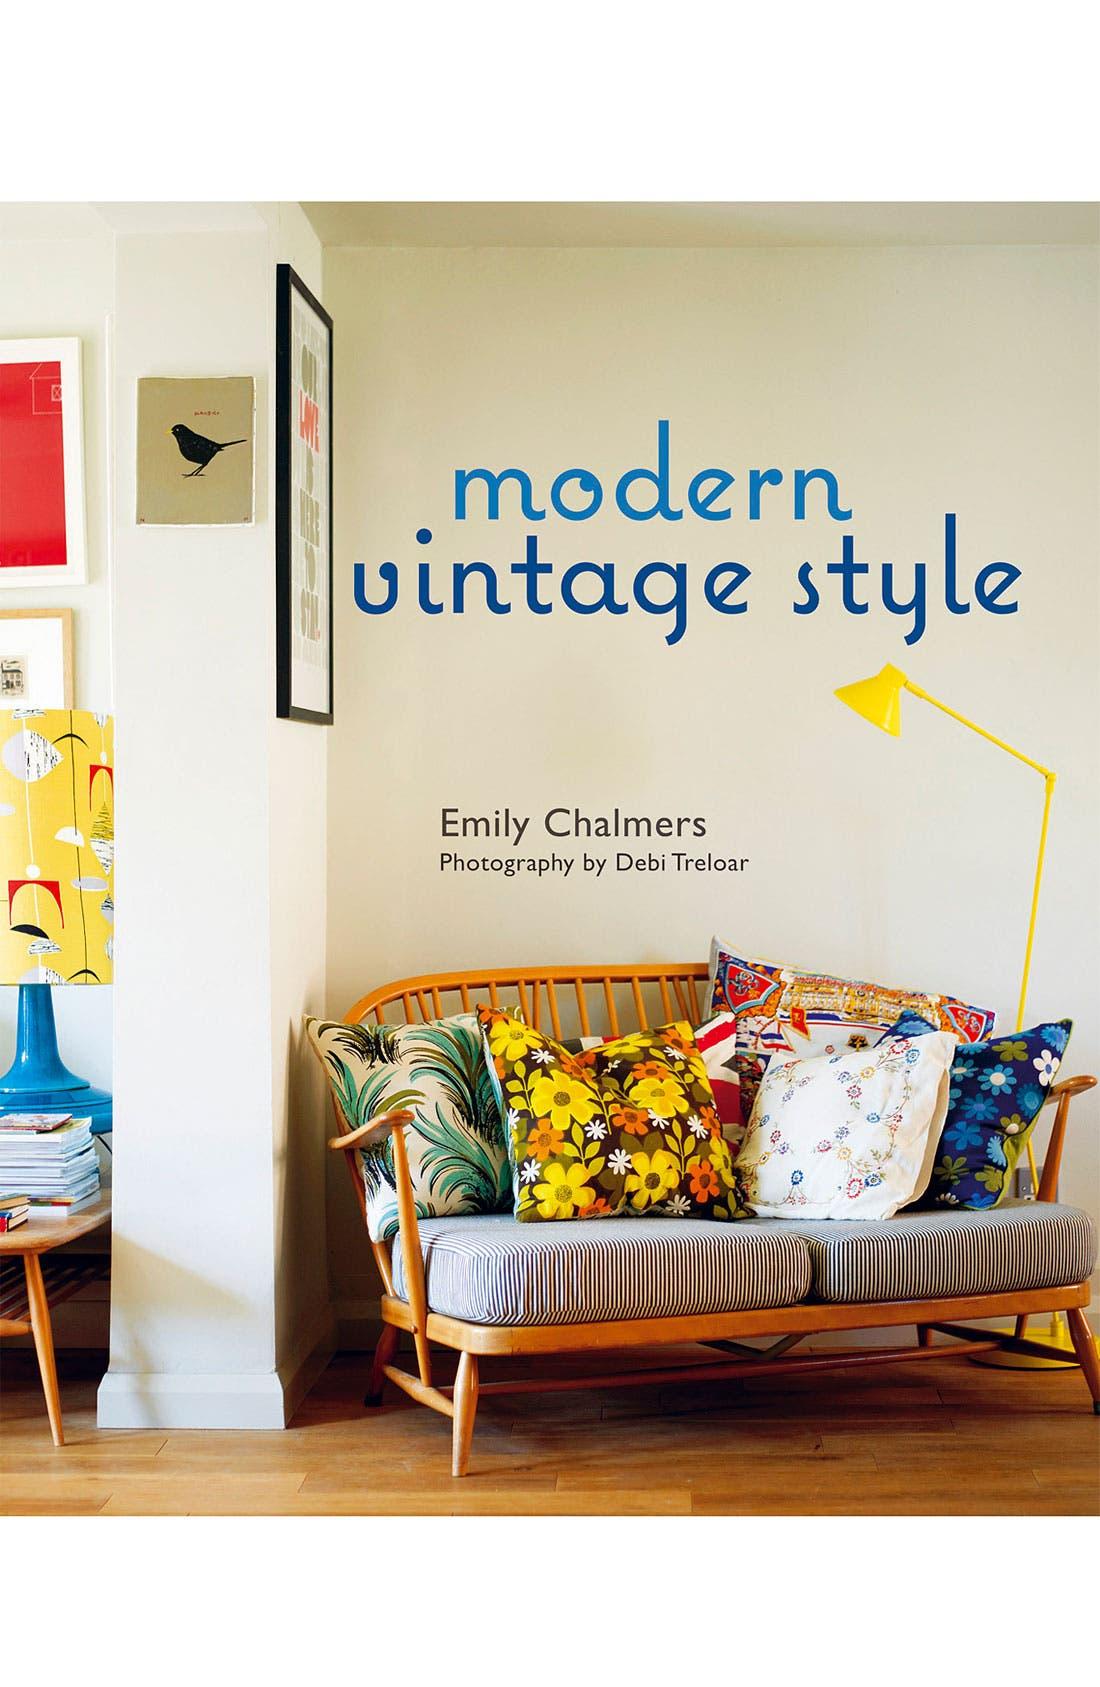 Alternate Image 1 Selected - 'Modern Vintage Style' Interior Design Book